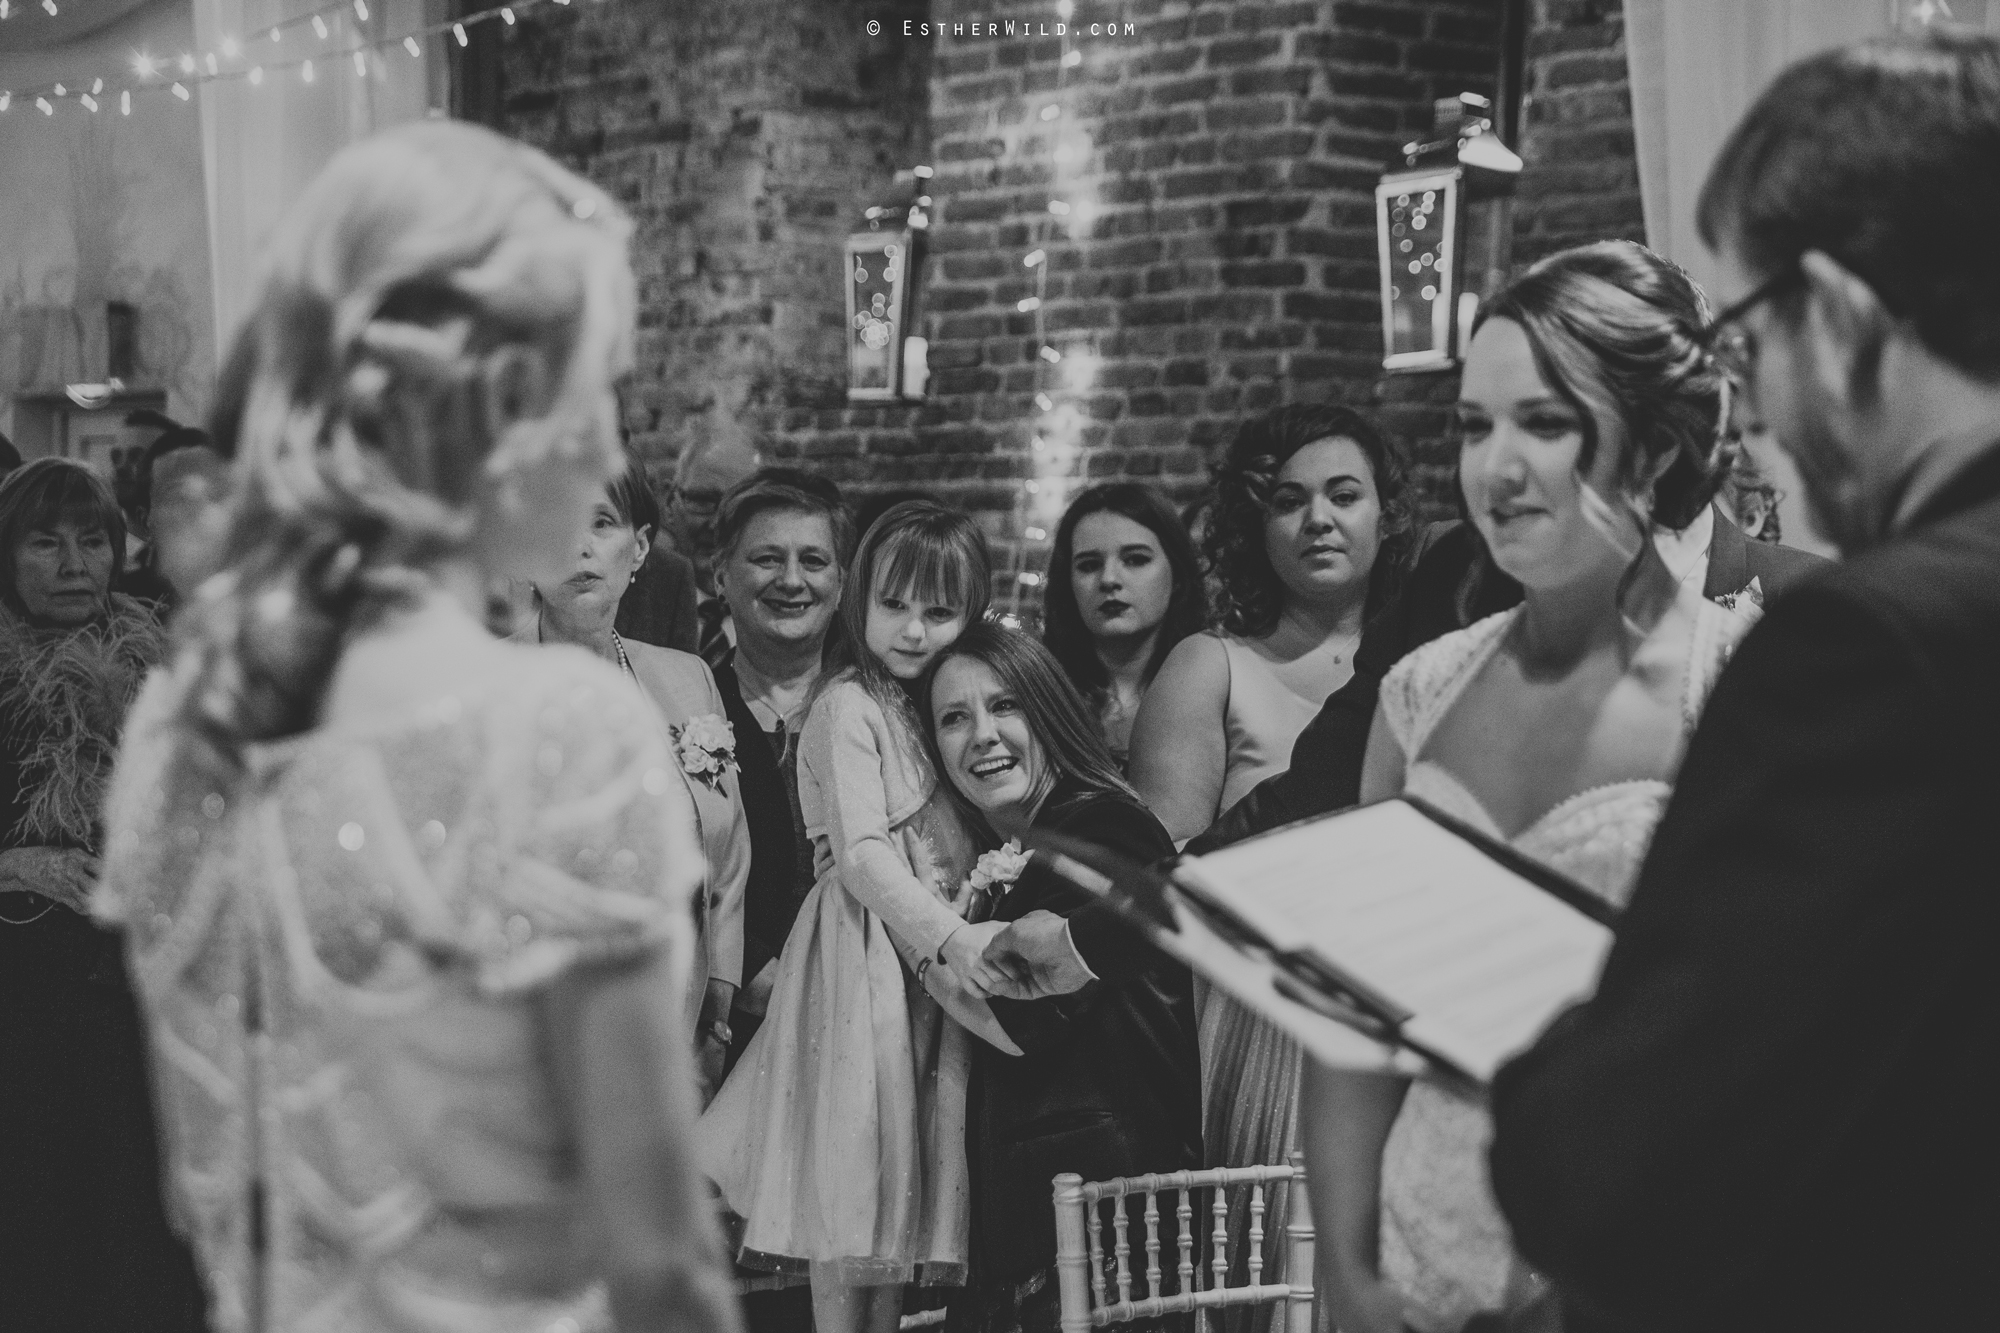 Elms_Barn_Weddings_Suffolk_Photographer_Copyright_Esther_Wild_IMG_1159-2.jpg